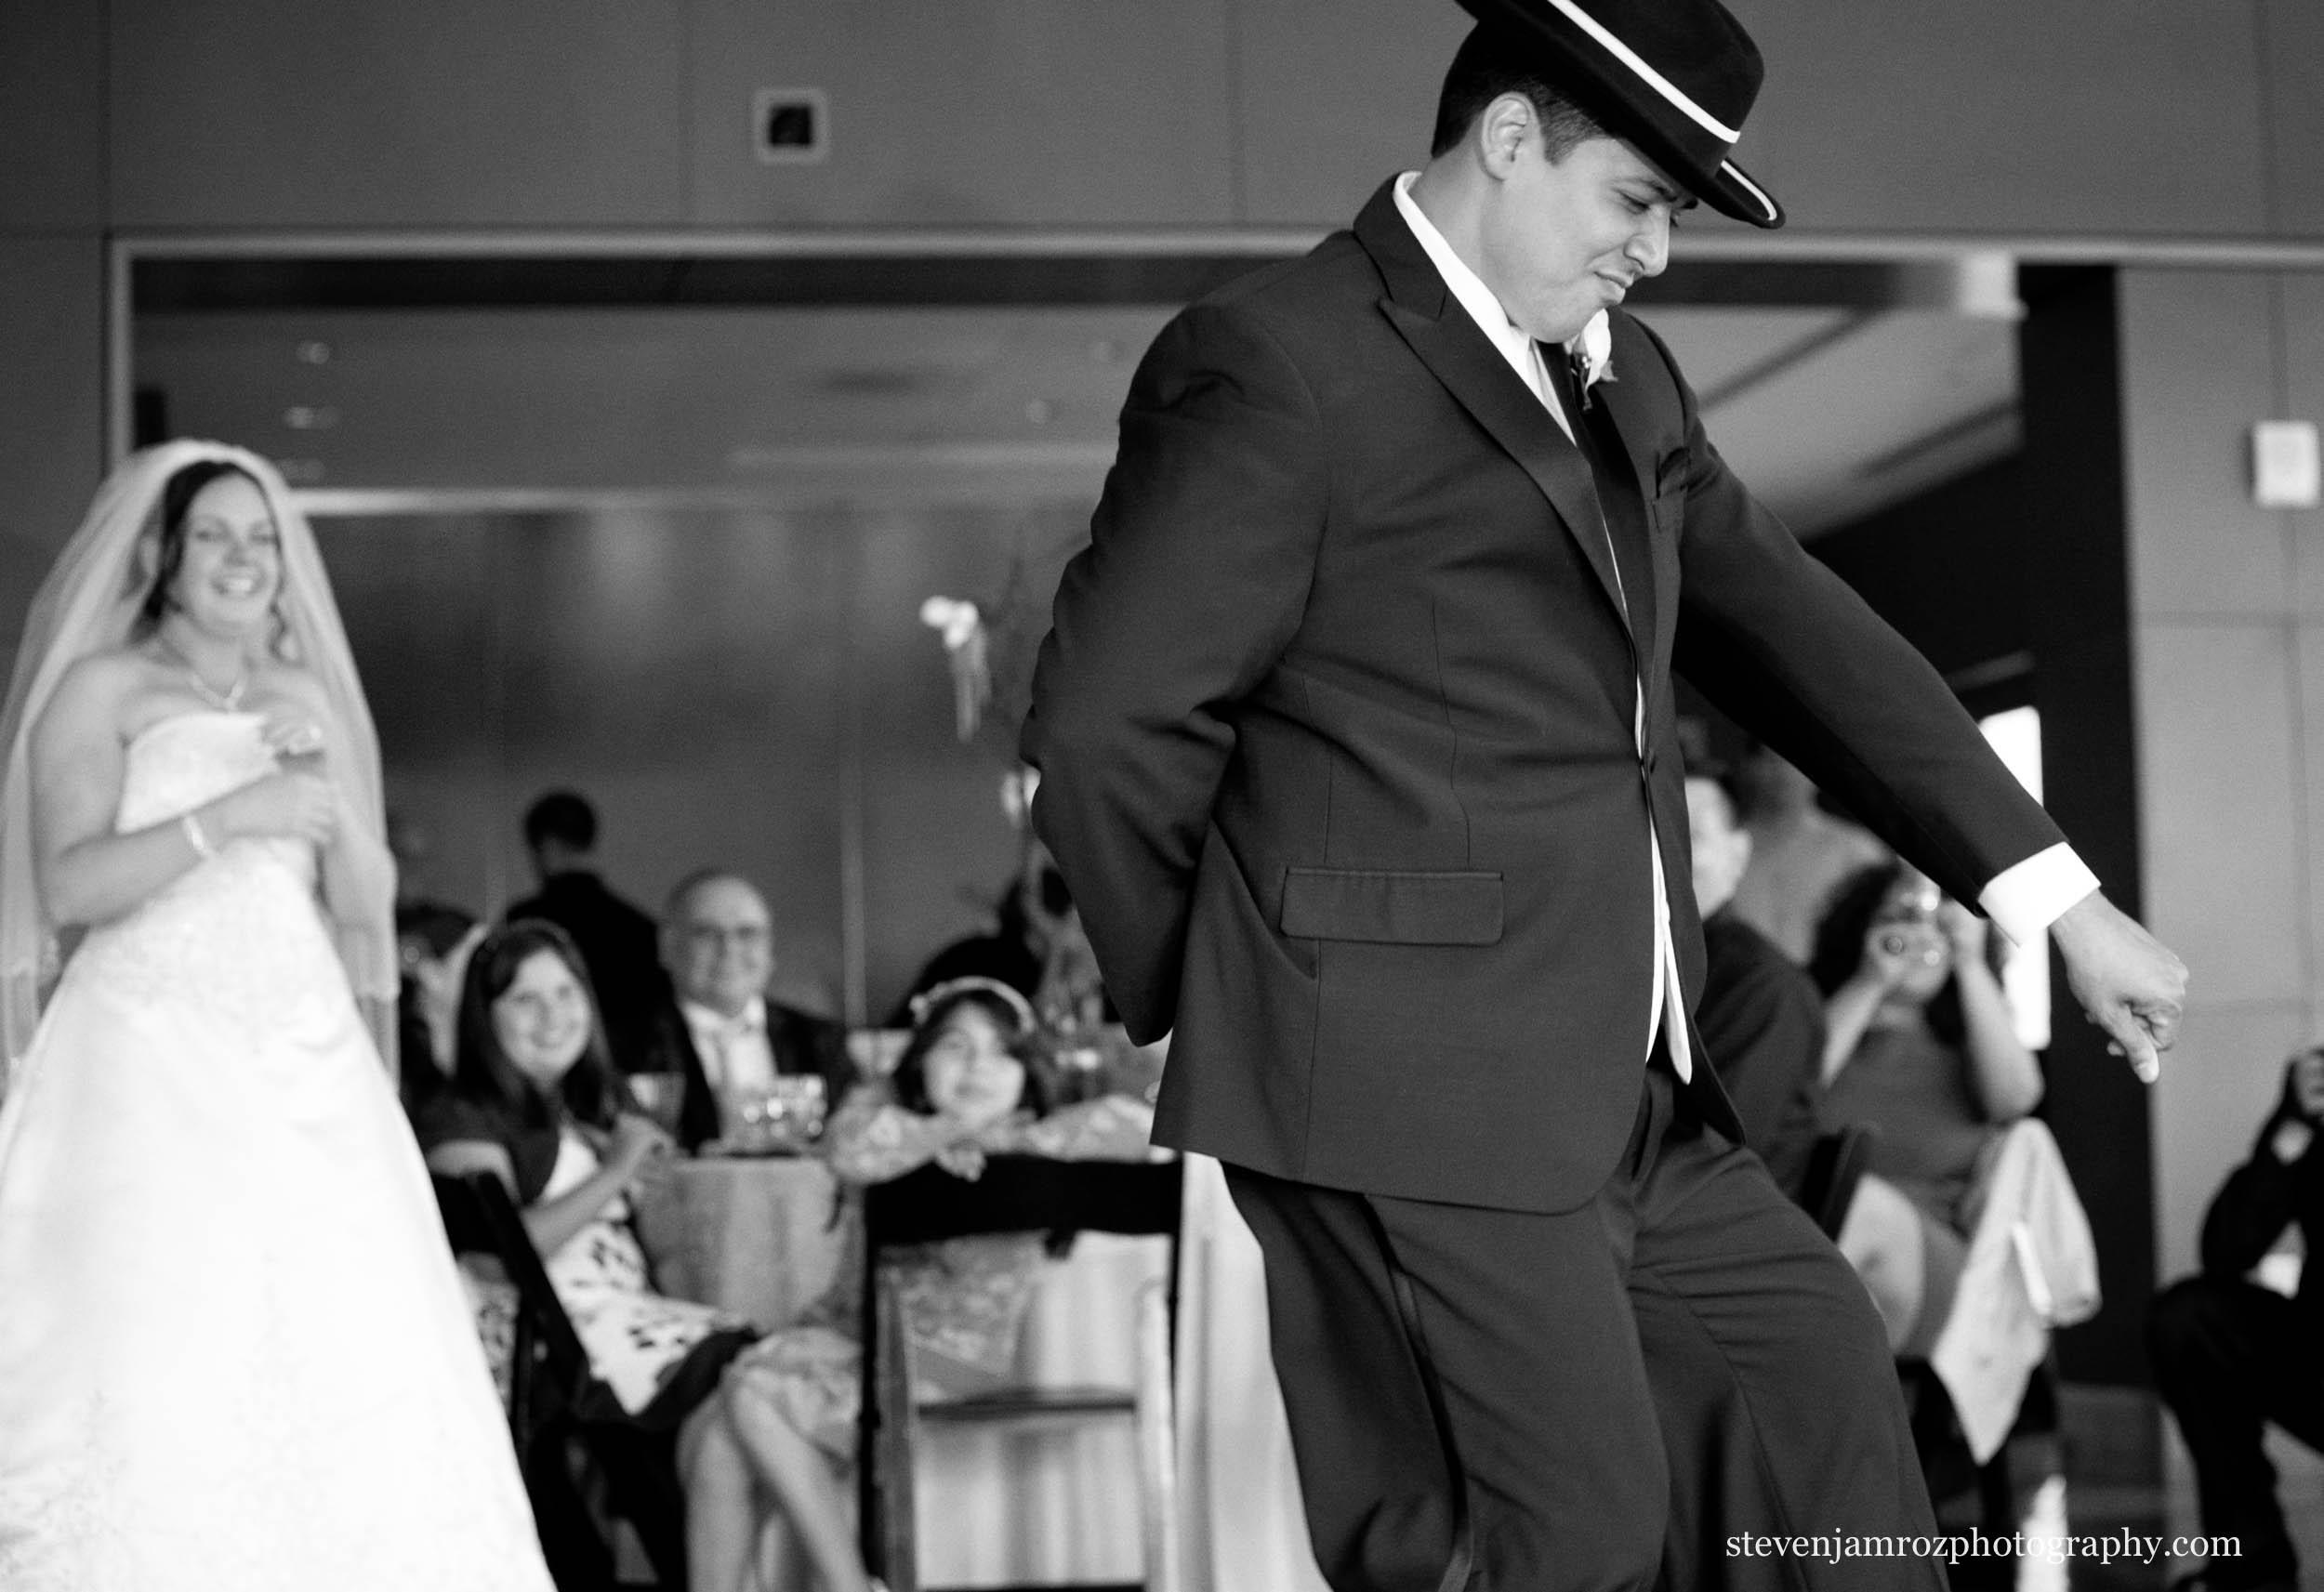 beat-it-michael-jackson-wedding-reception-song-0812.jpg